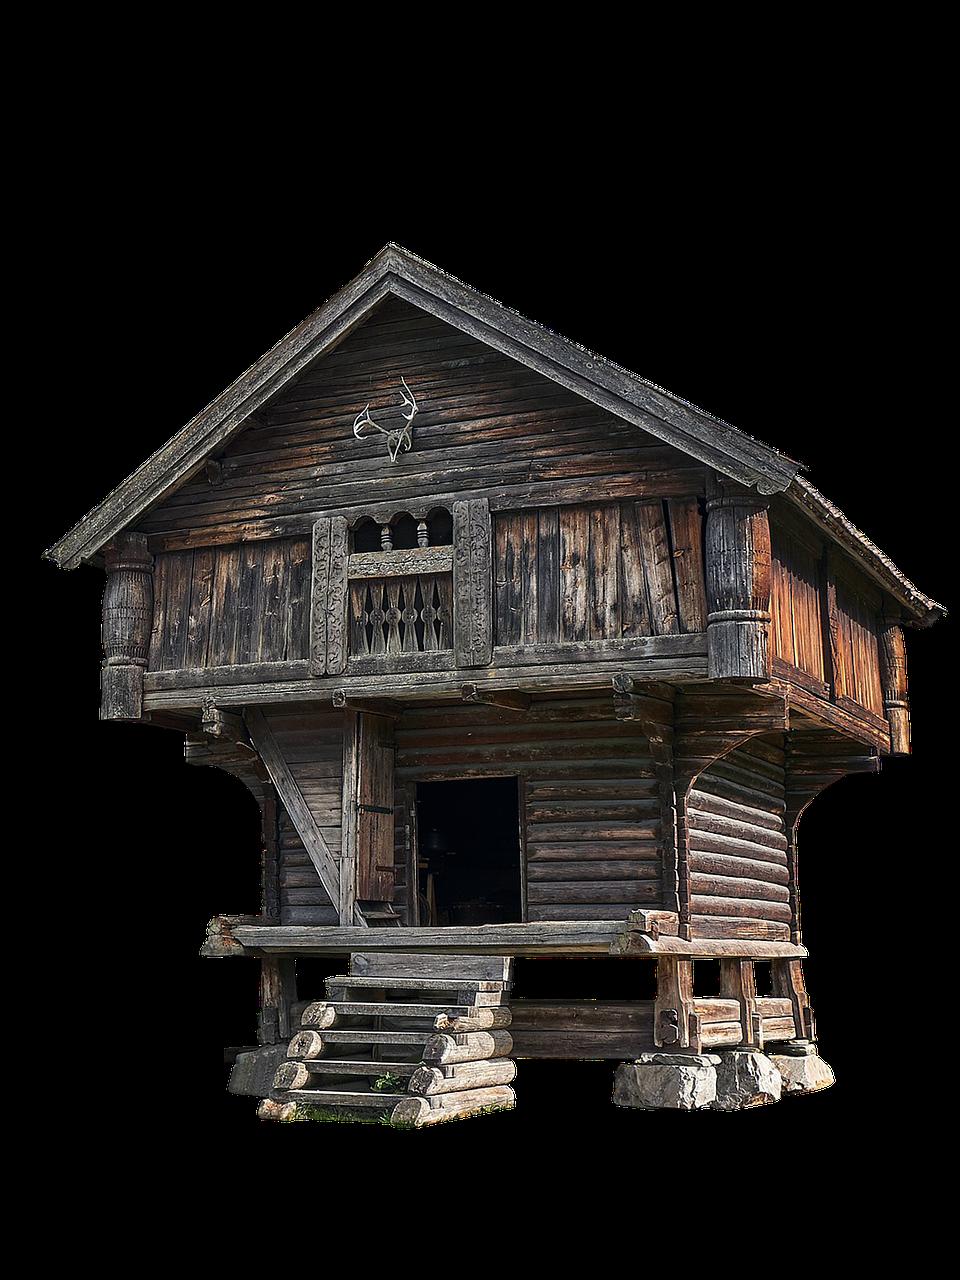 Chalet House Cabin Cottage  - jean52Photosstock / Pixabay